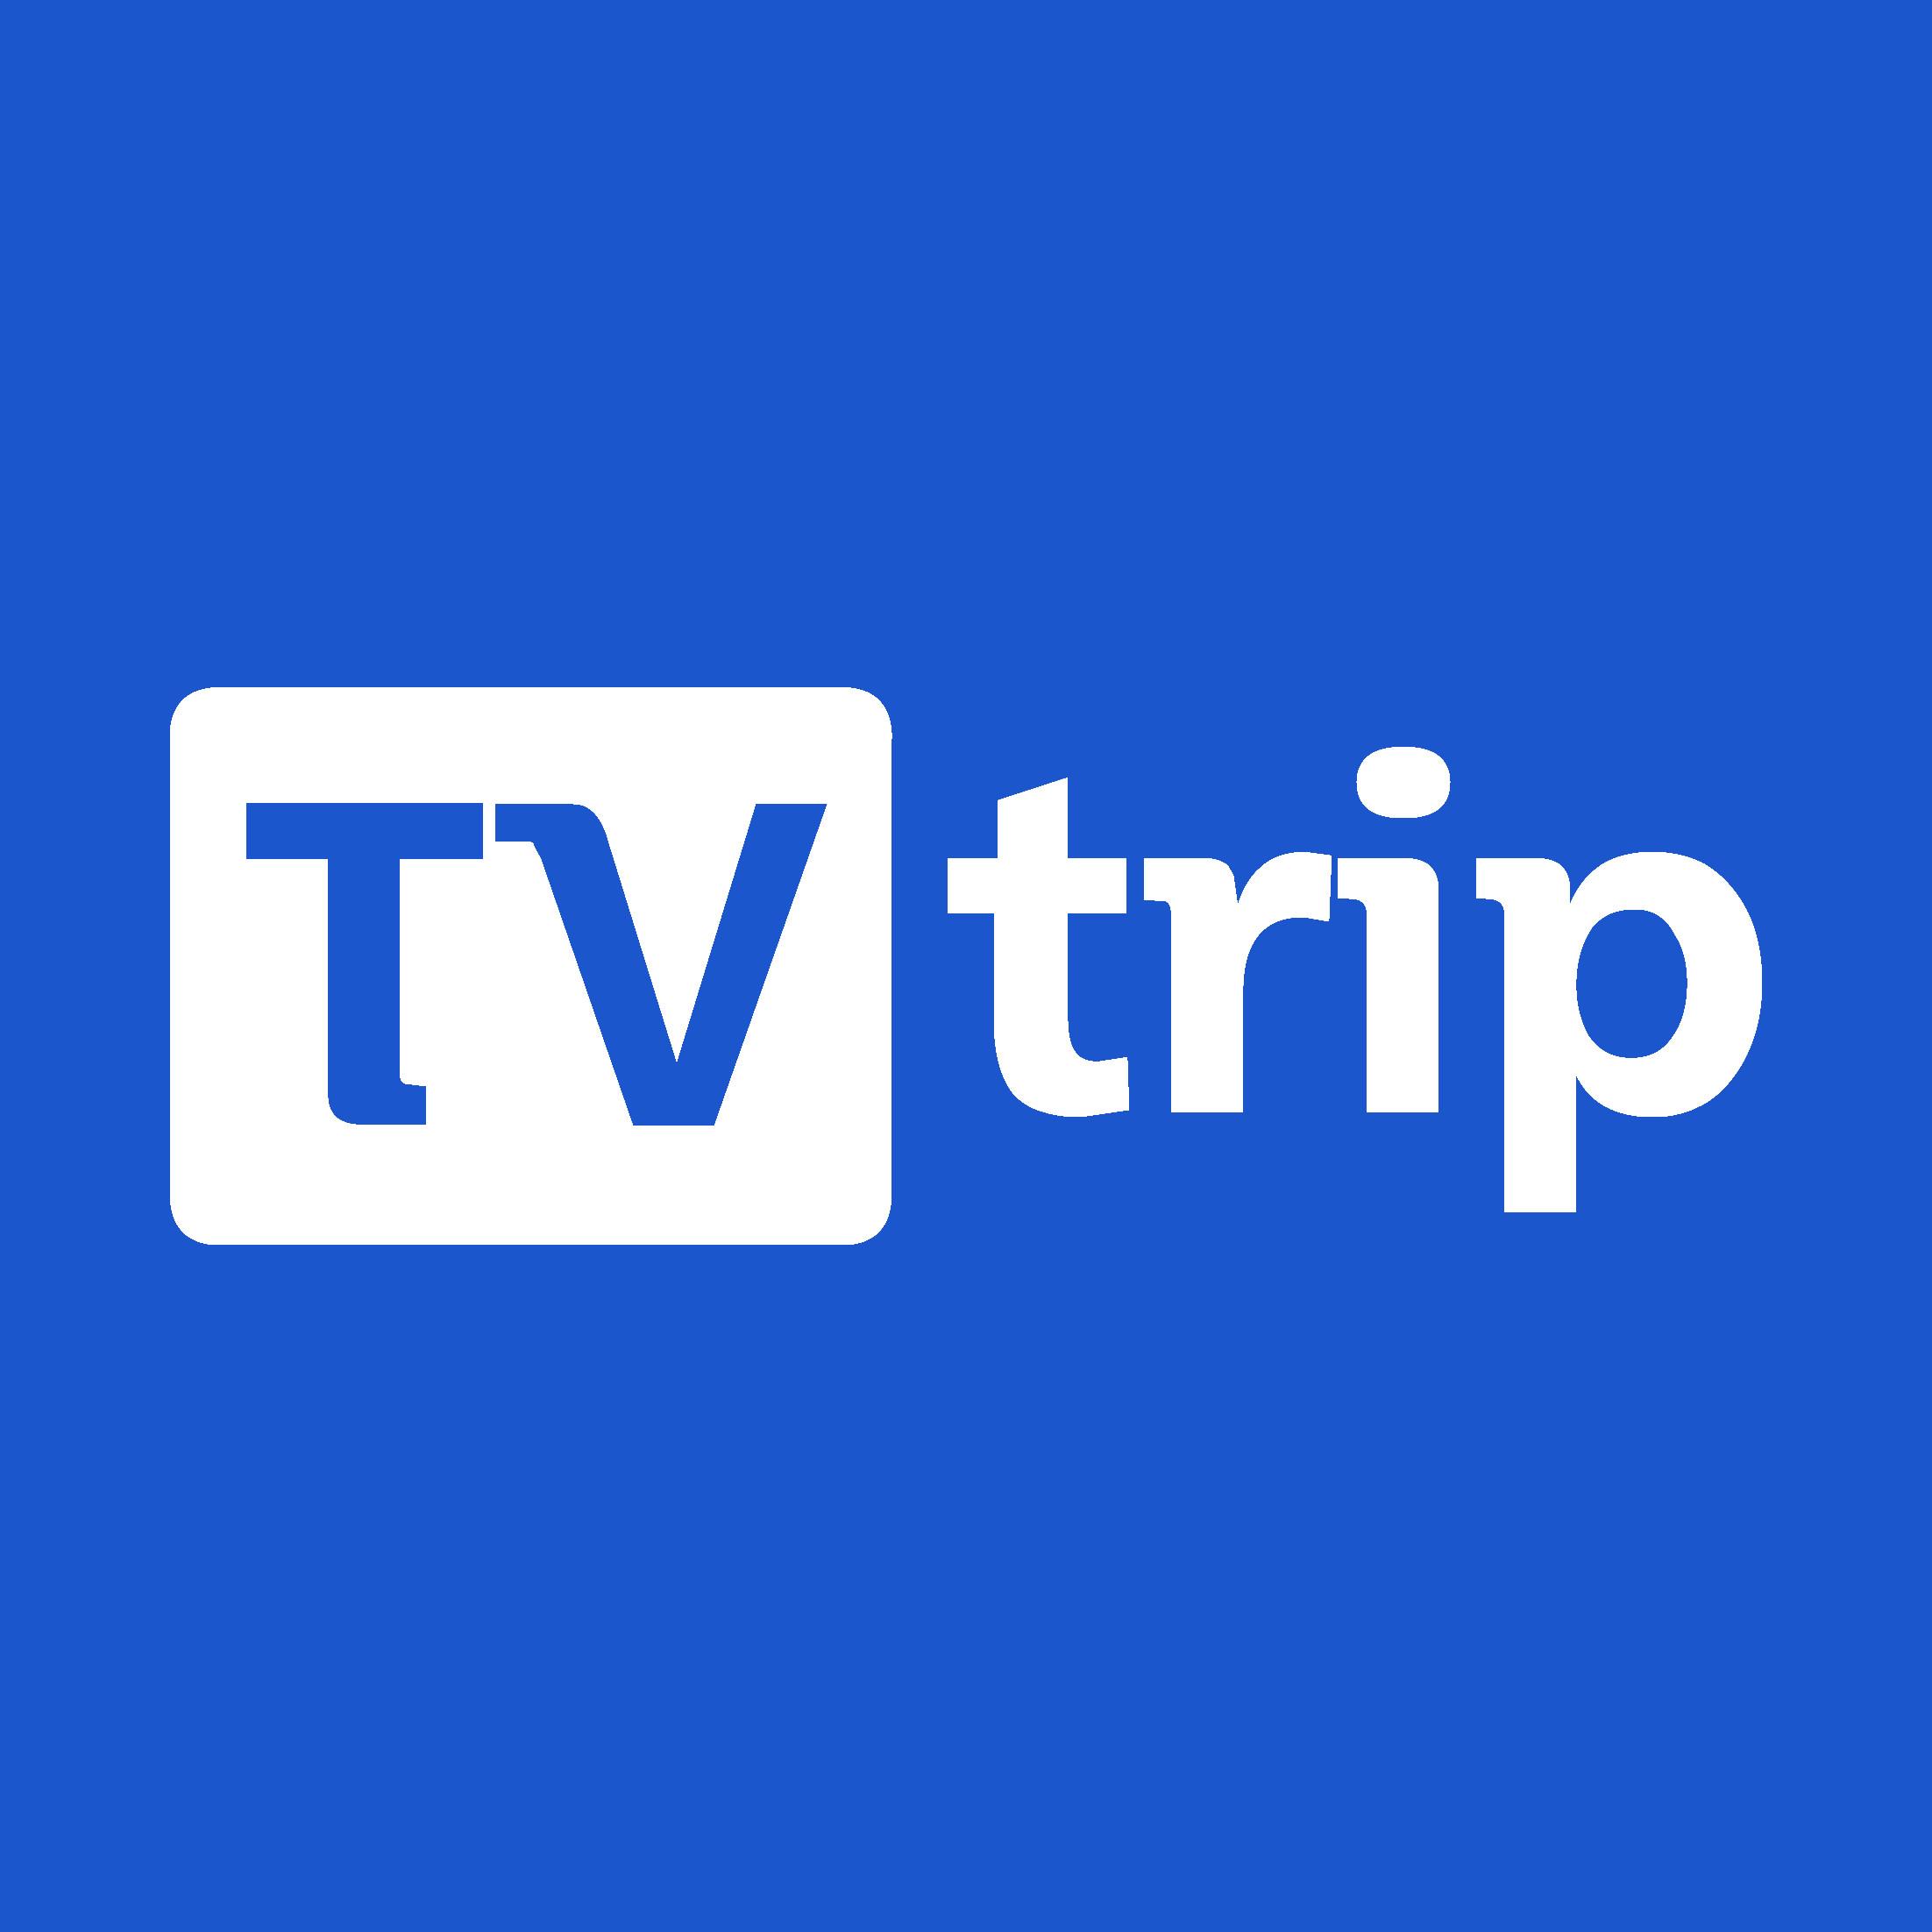 TVtrip